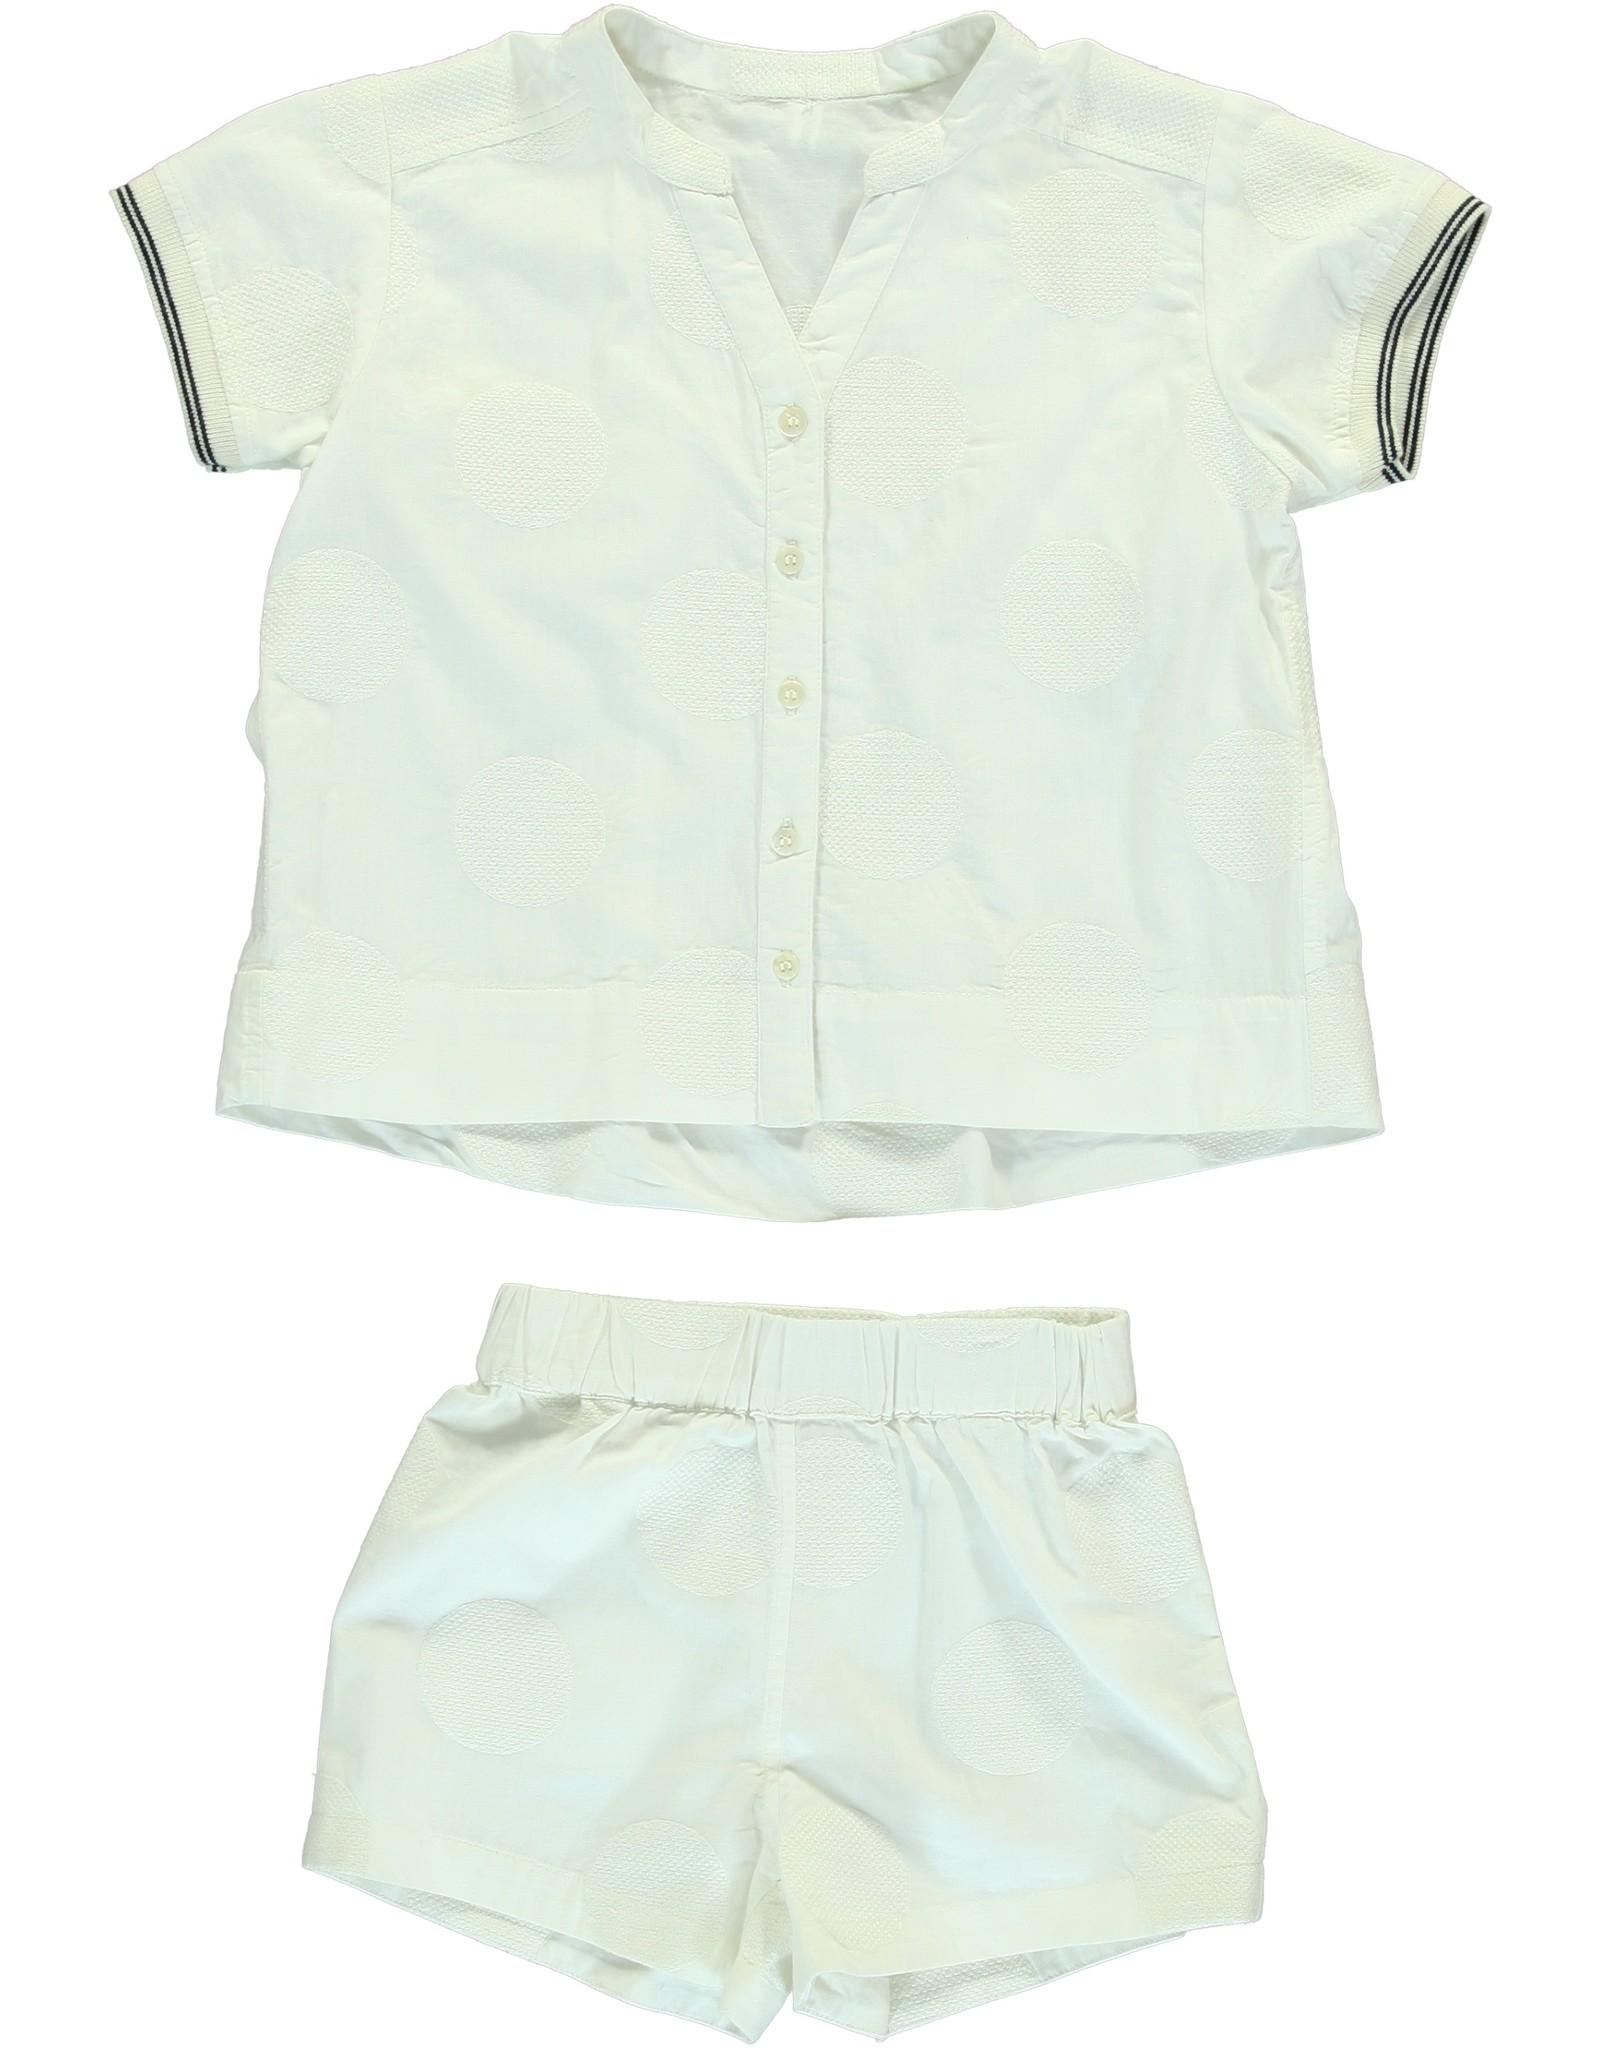 Dorélit Canopus & Cupido   Pajama Set Woven   Offwhite